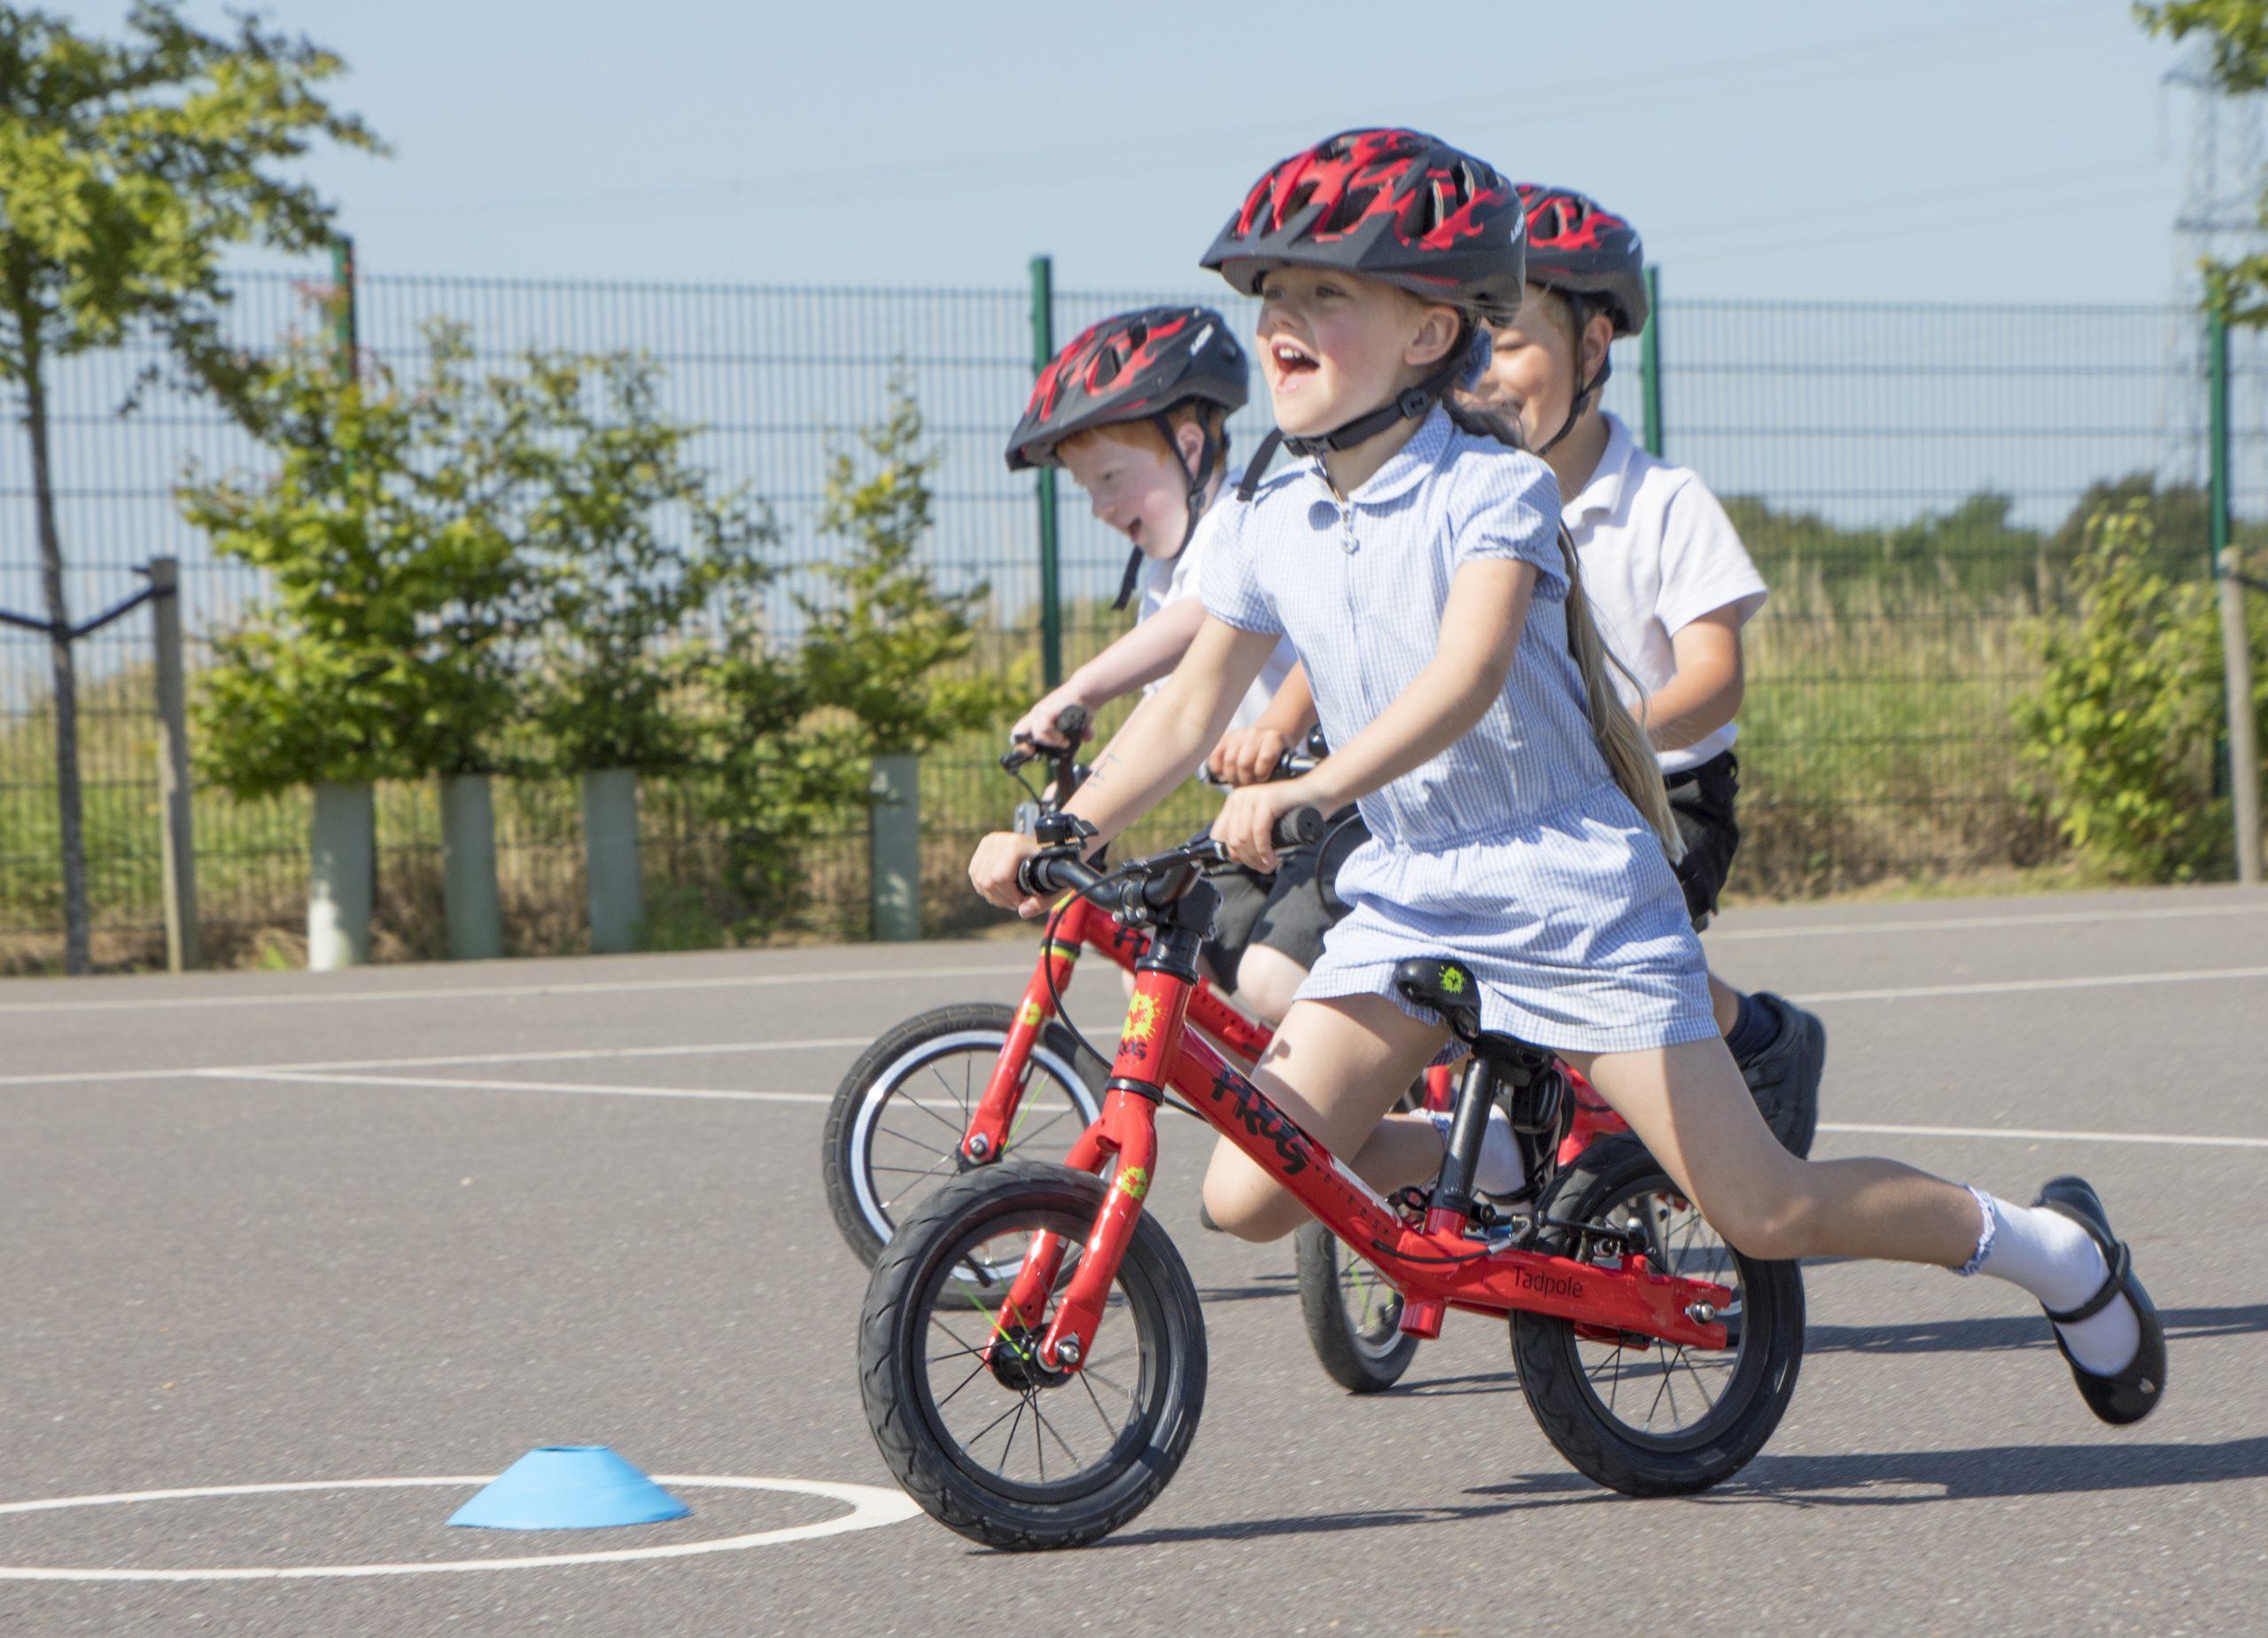 A young girl rides a balance bike